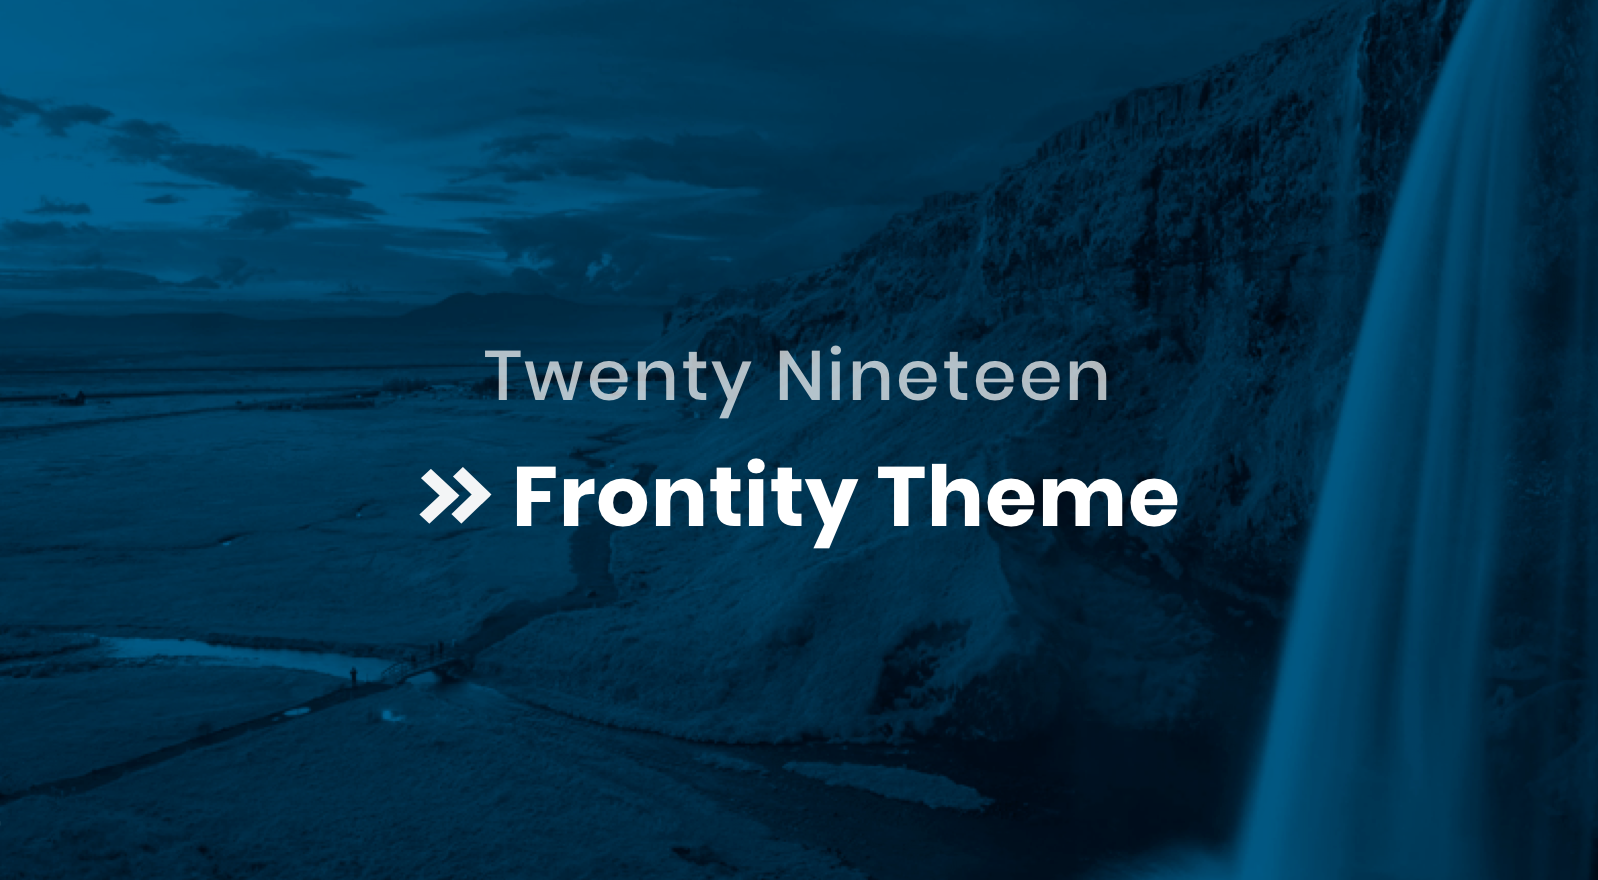 Twenty Nineteen Frontity Theme Featured Image